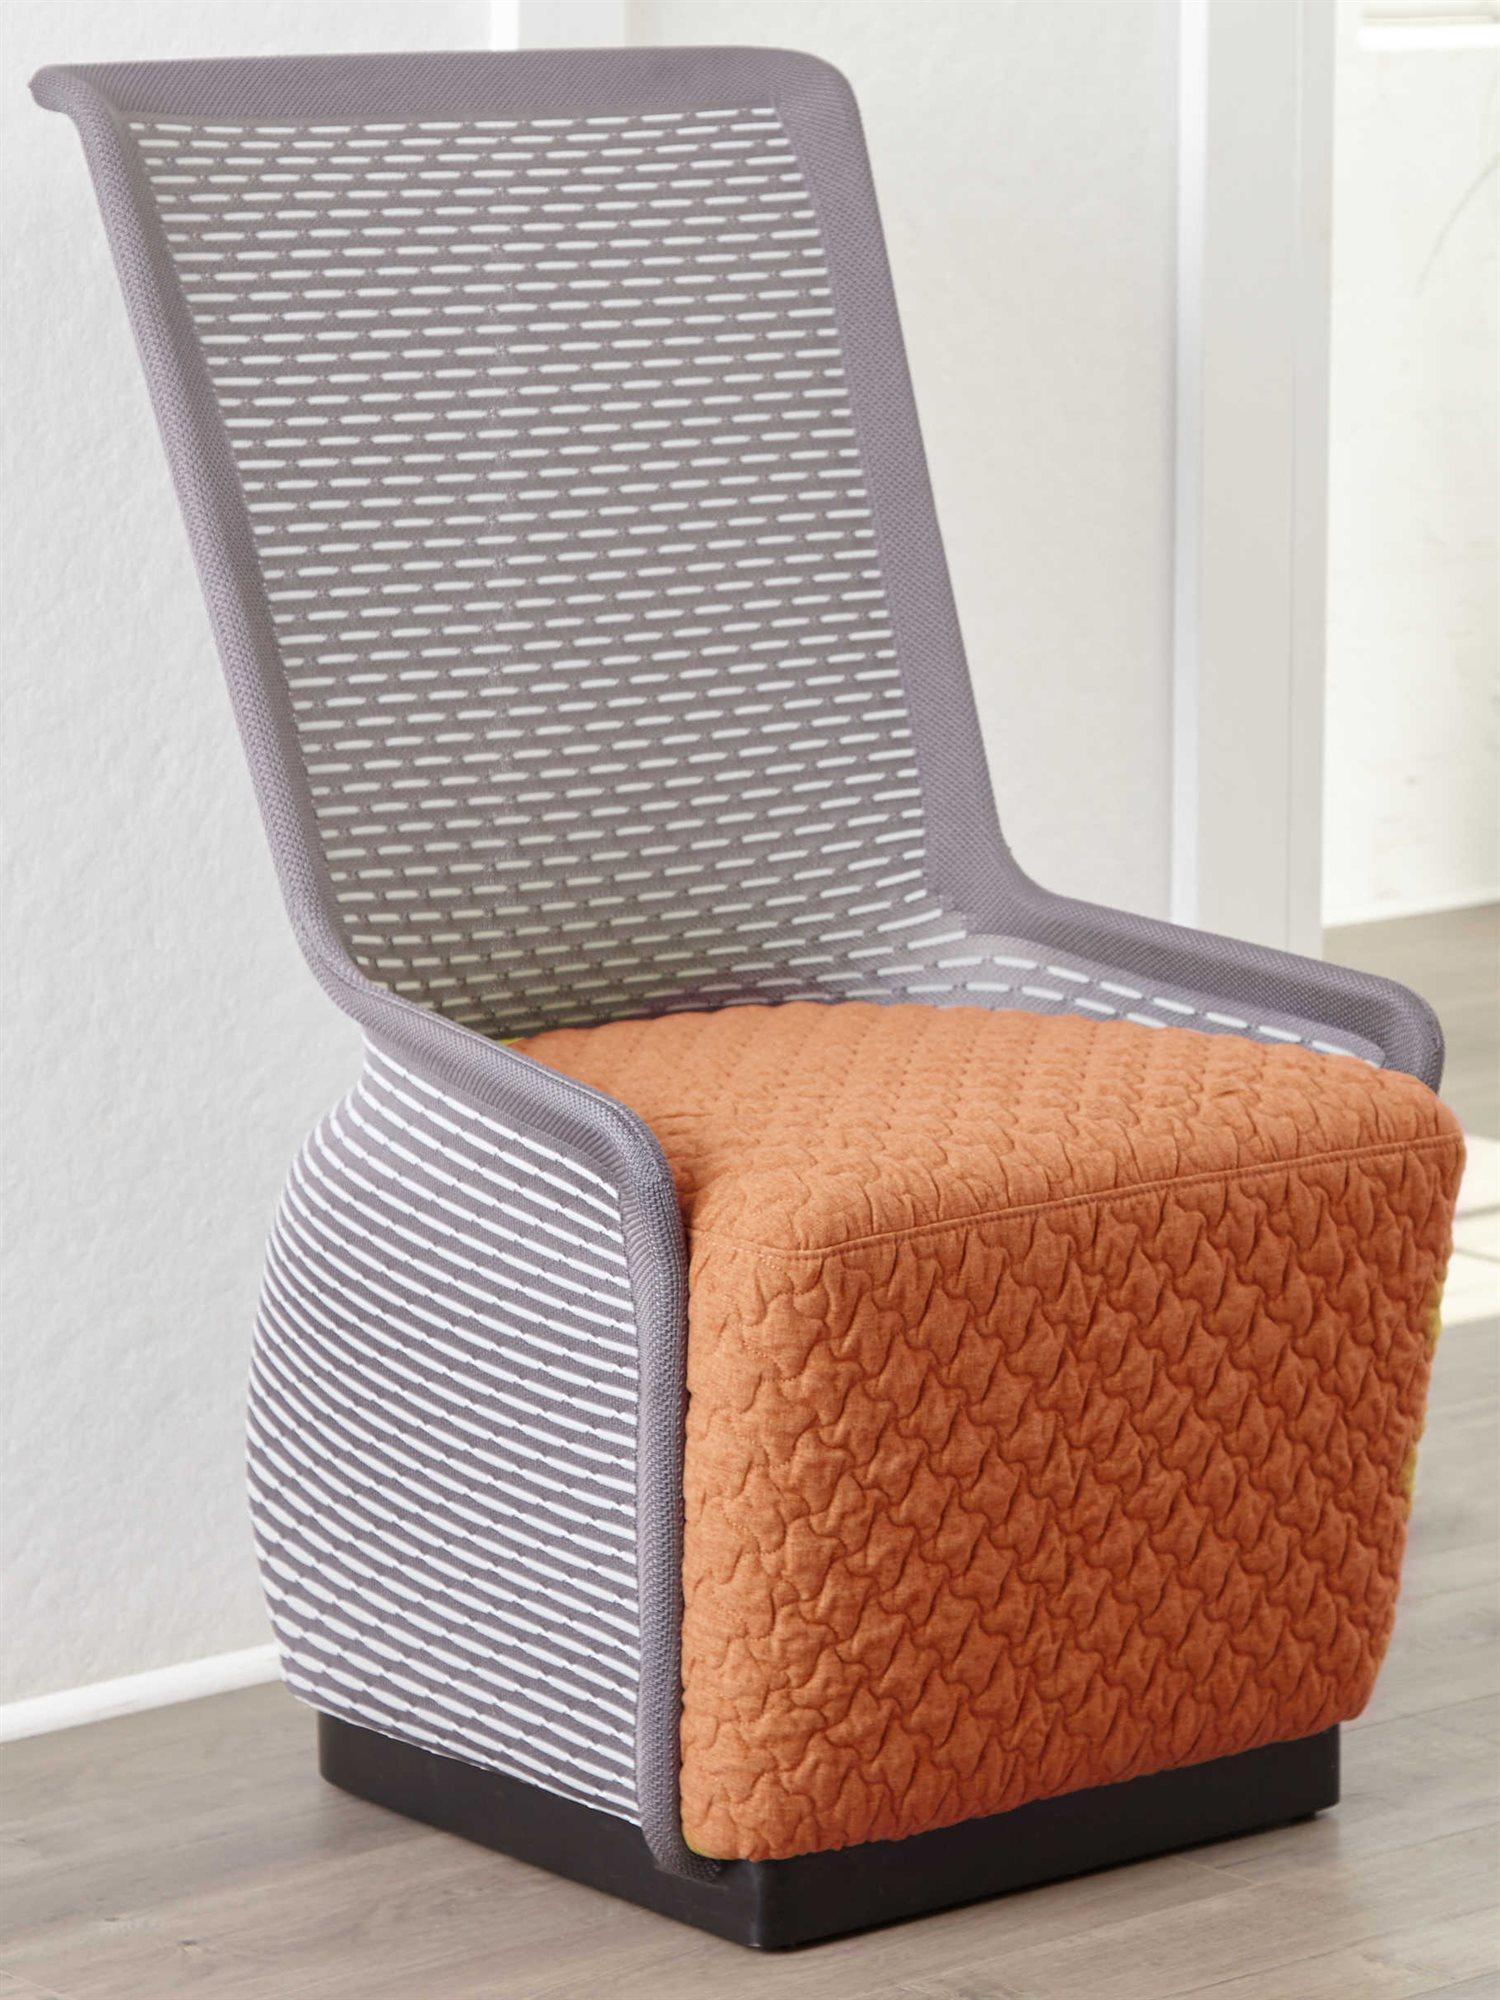 Unique furniture tulip grey orange accent chair je5441 - Unique accent chairs for living room ...